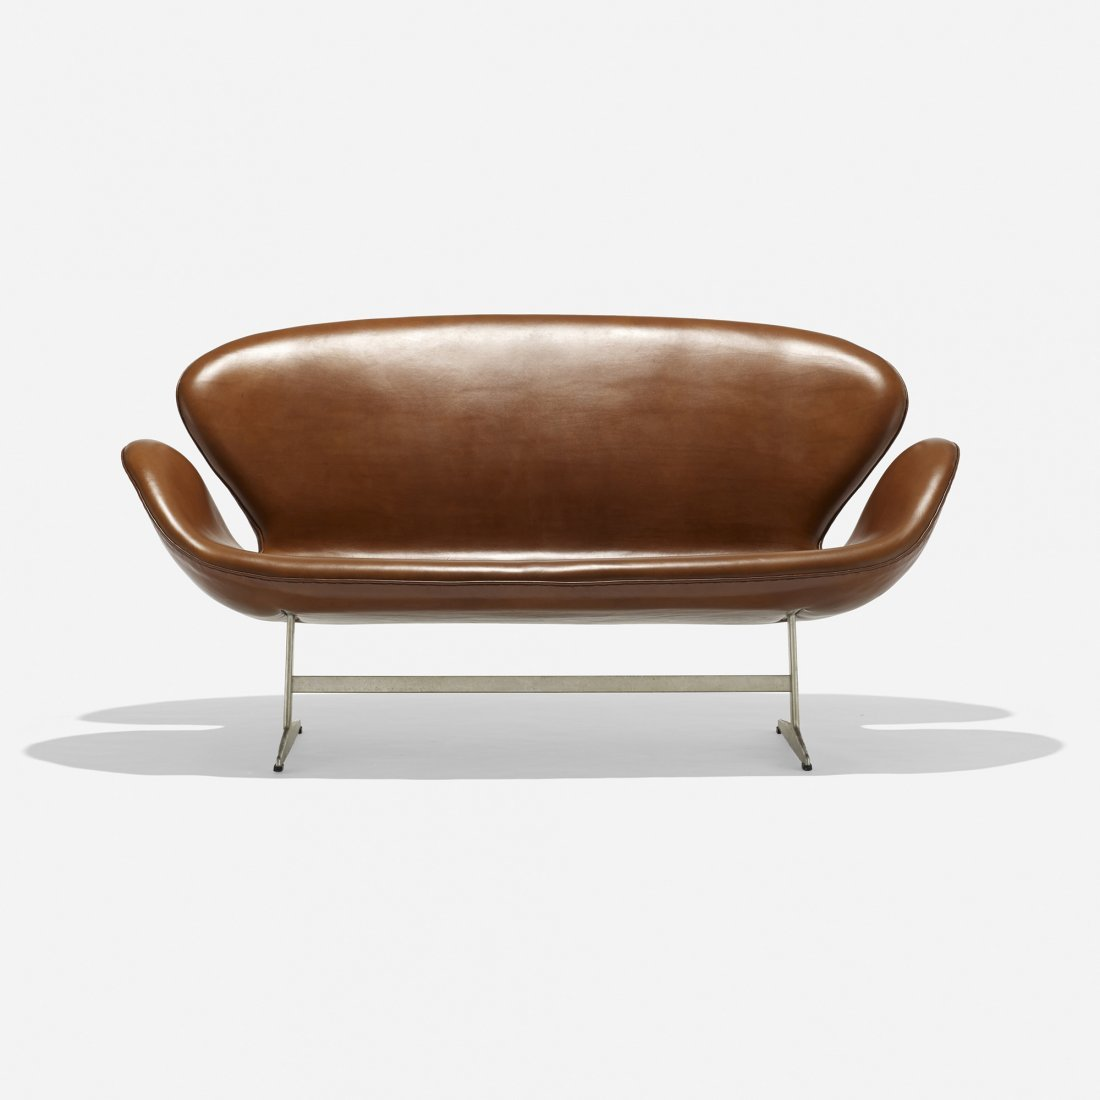 Arne Jacobsen Swan settee, model 3321